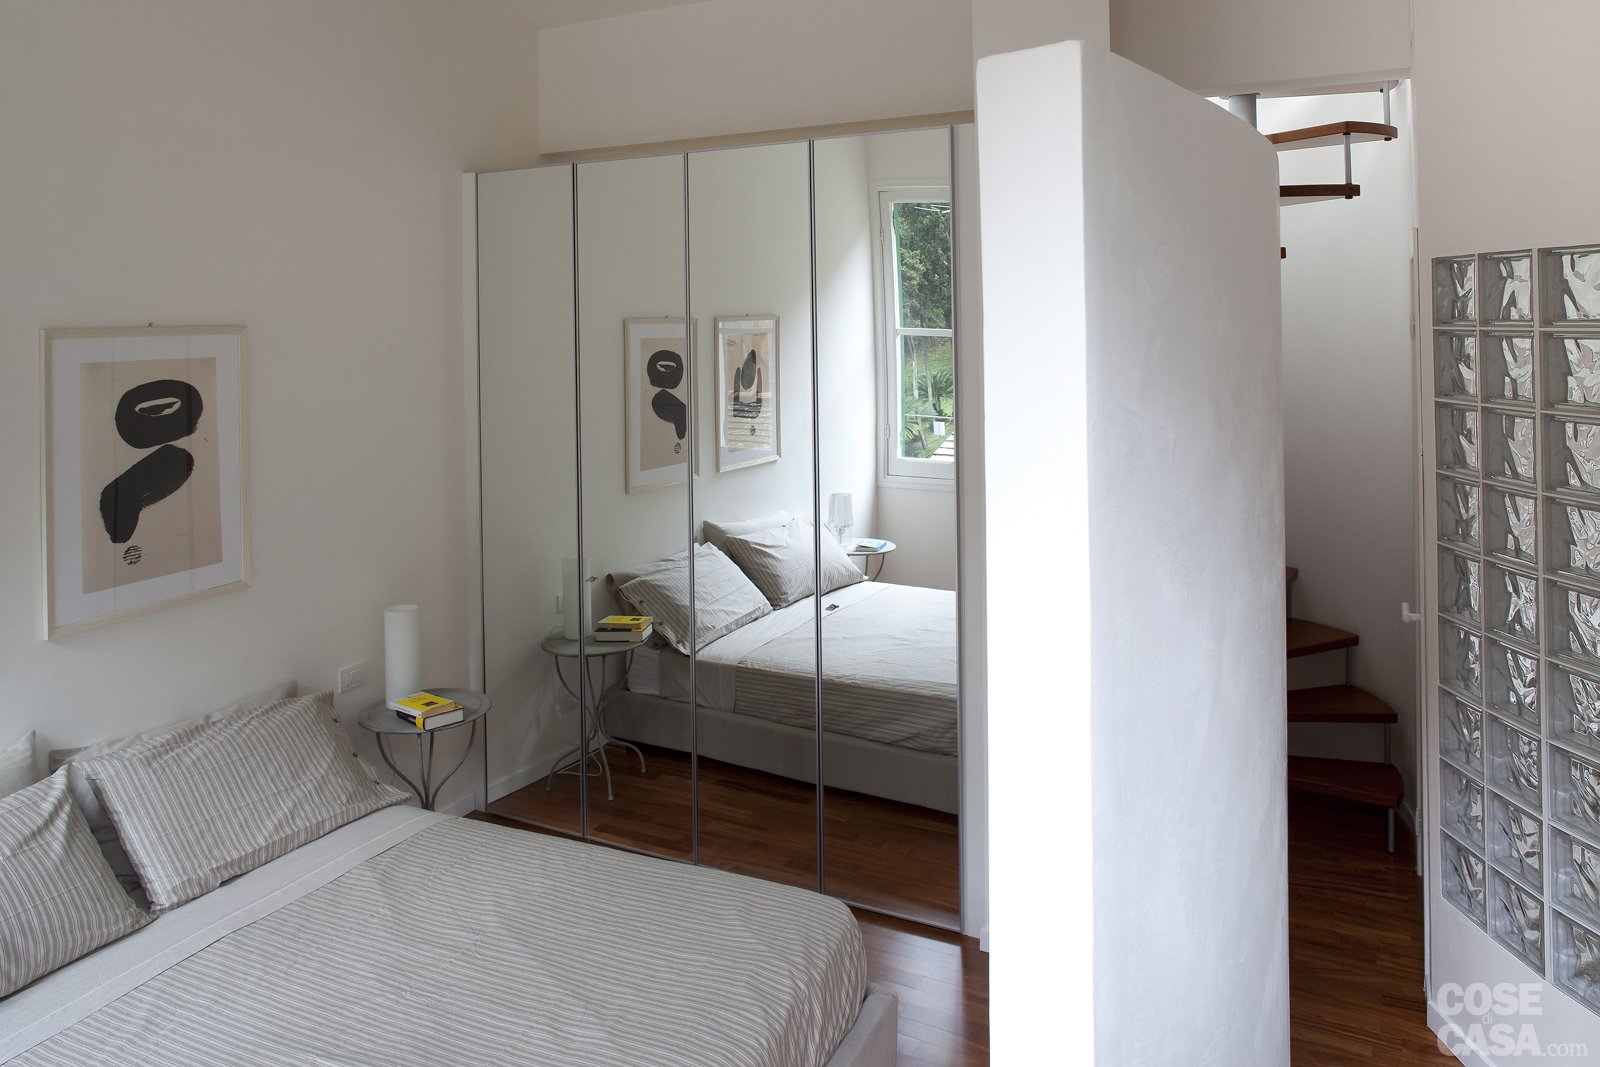 48 mq bilocale su due livelli cose di casa - Camere da bagno ...